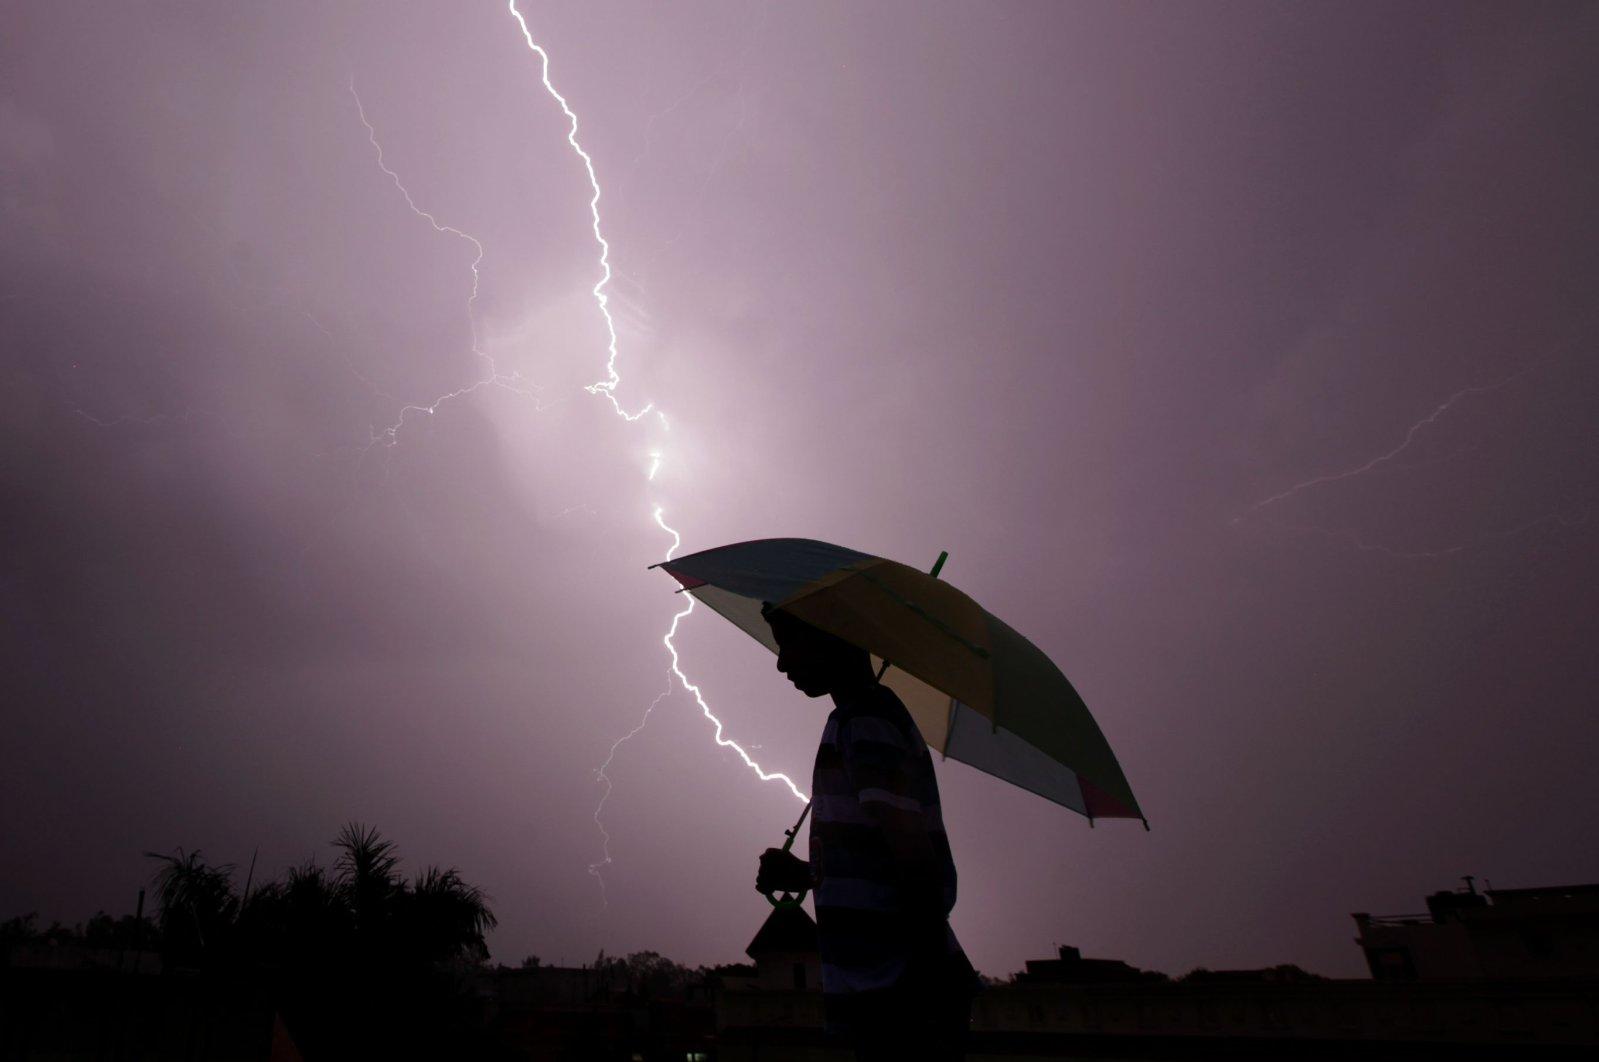 A pedestrian walks with an umbrella as lightning strikes during an evening thunderstorm in Jammu, India, May 15, 2015. (AFP Photo)